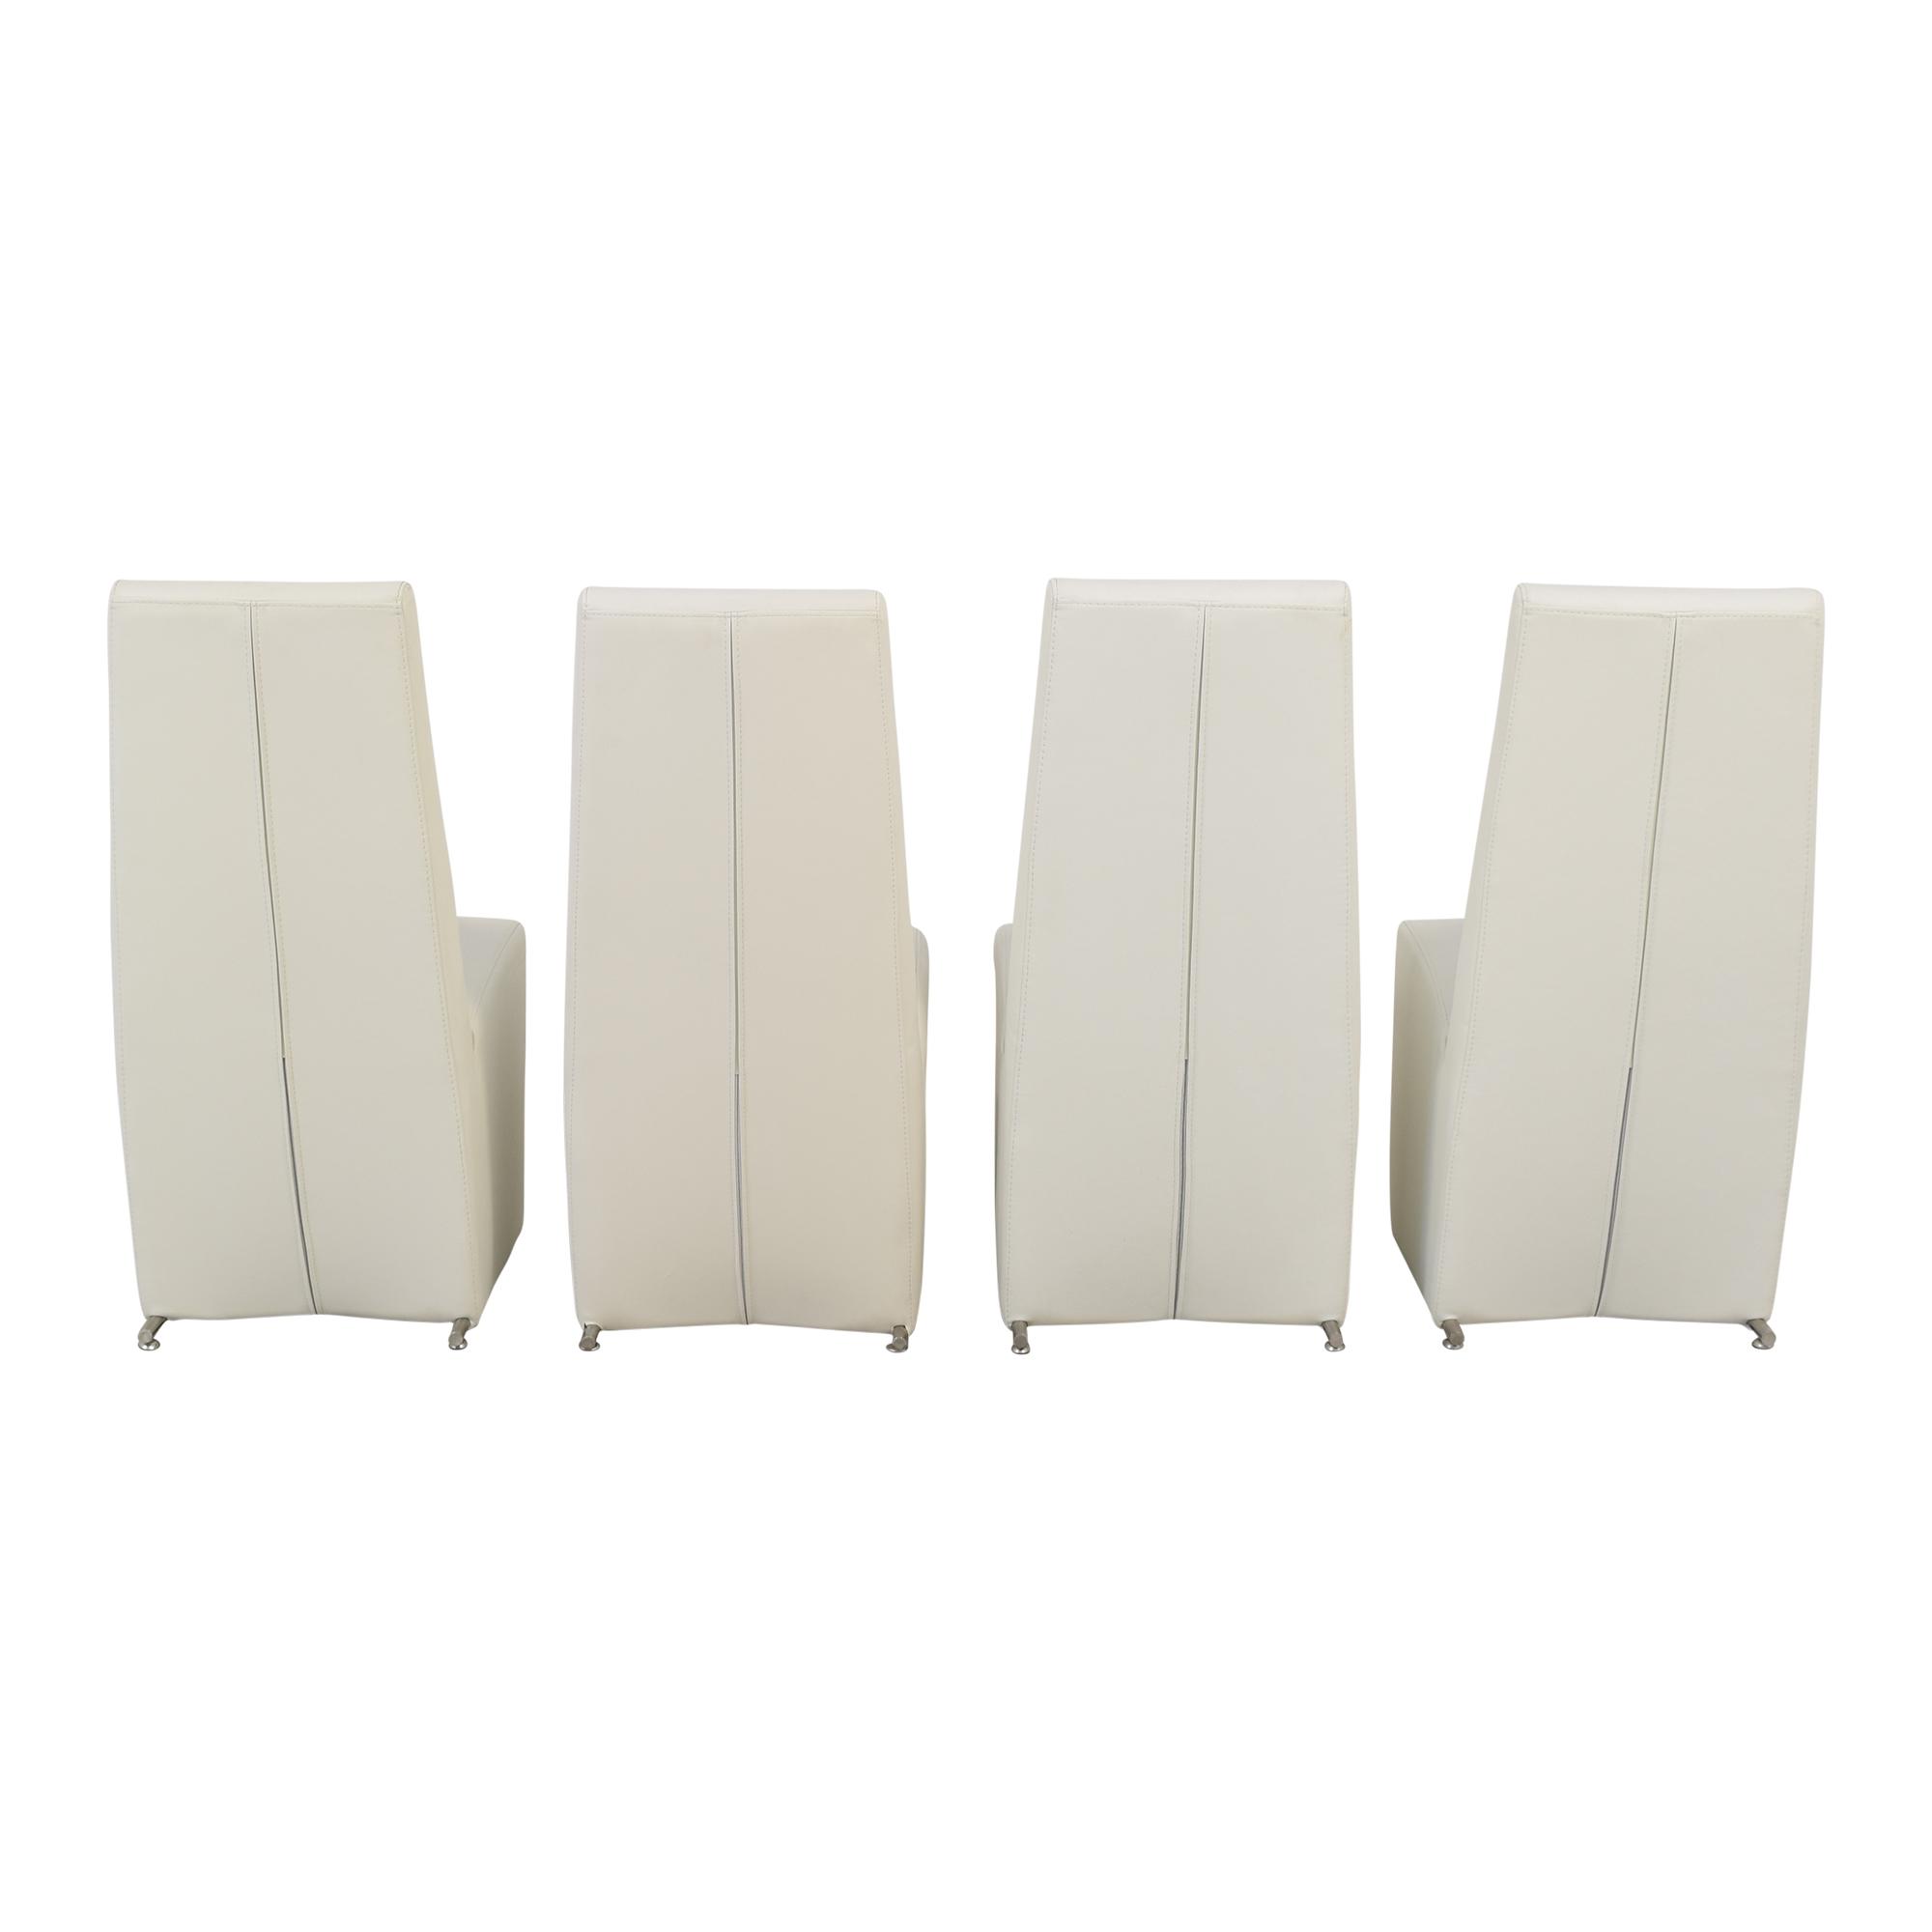 Star Furniture Ritz by Essentials Tobi Dining Side Chairs sale